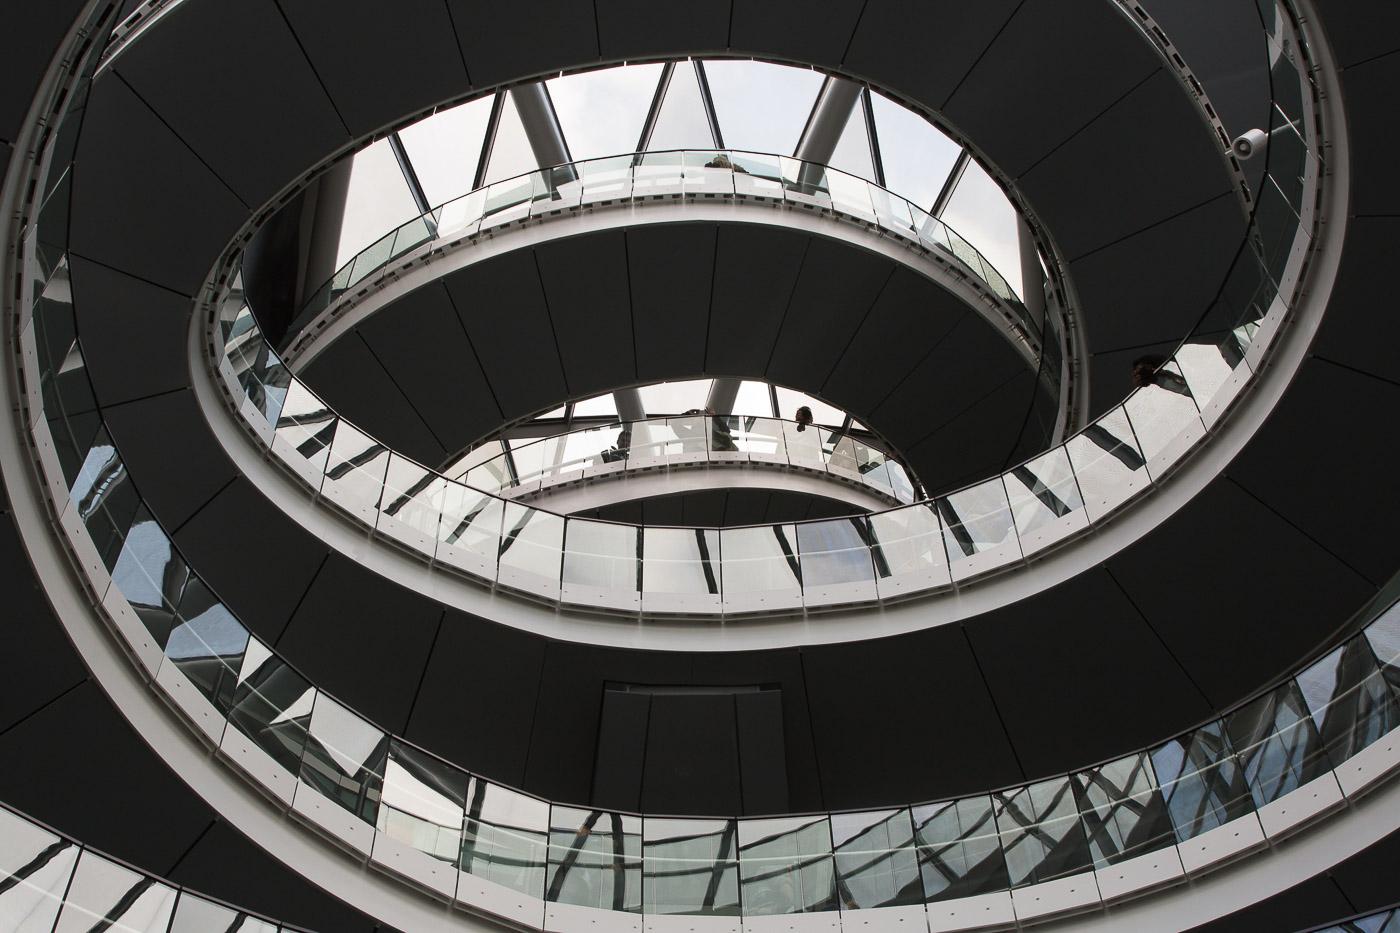 Memorable Staircase Designs - City Hall, London